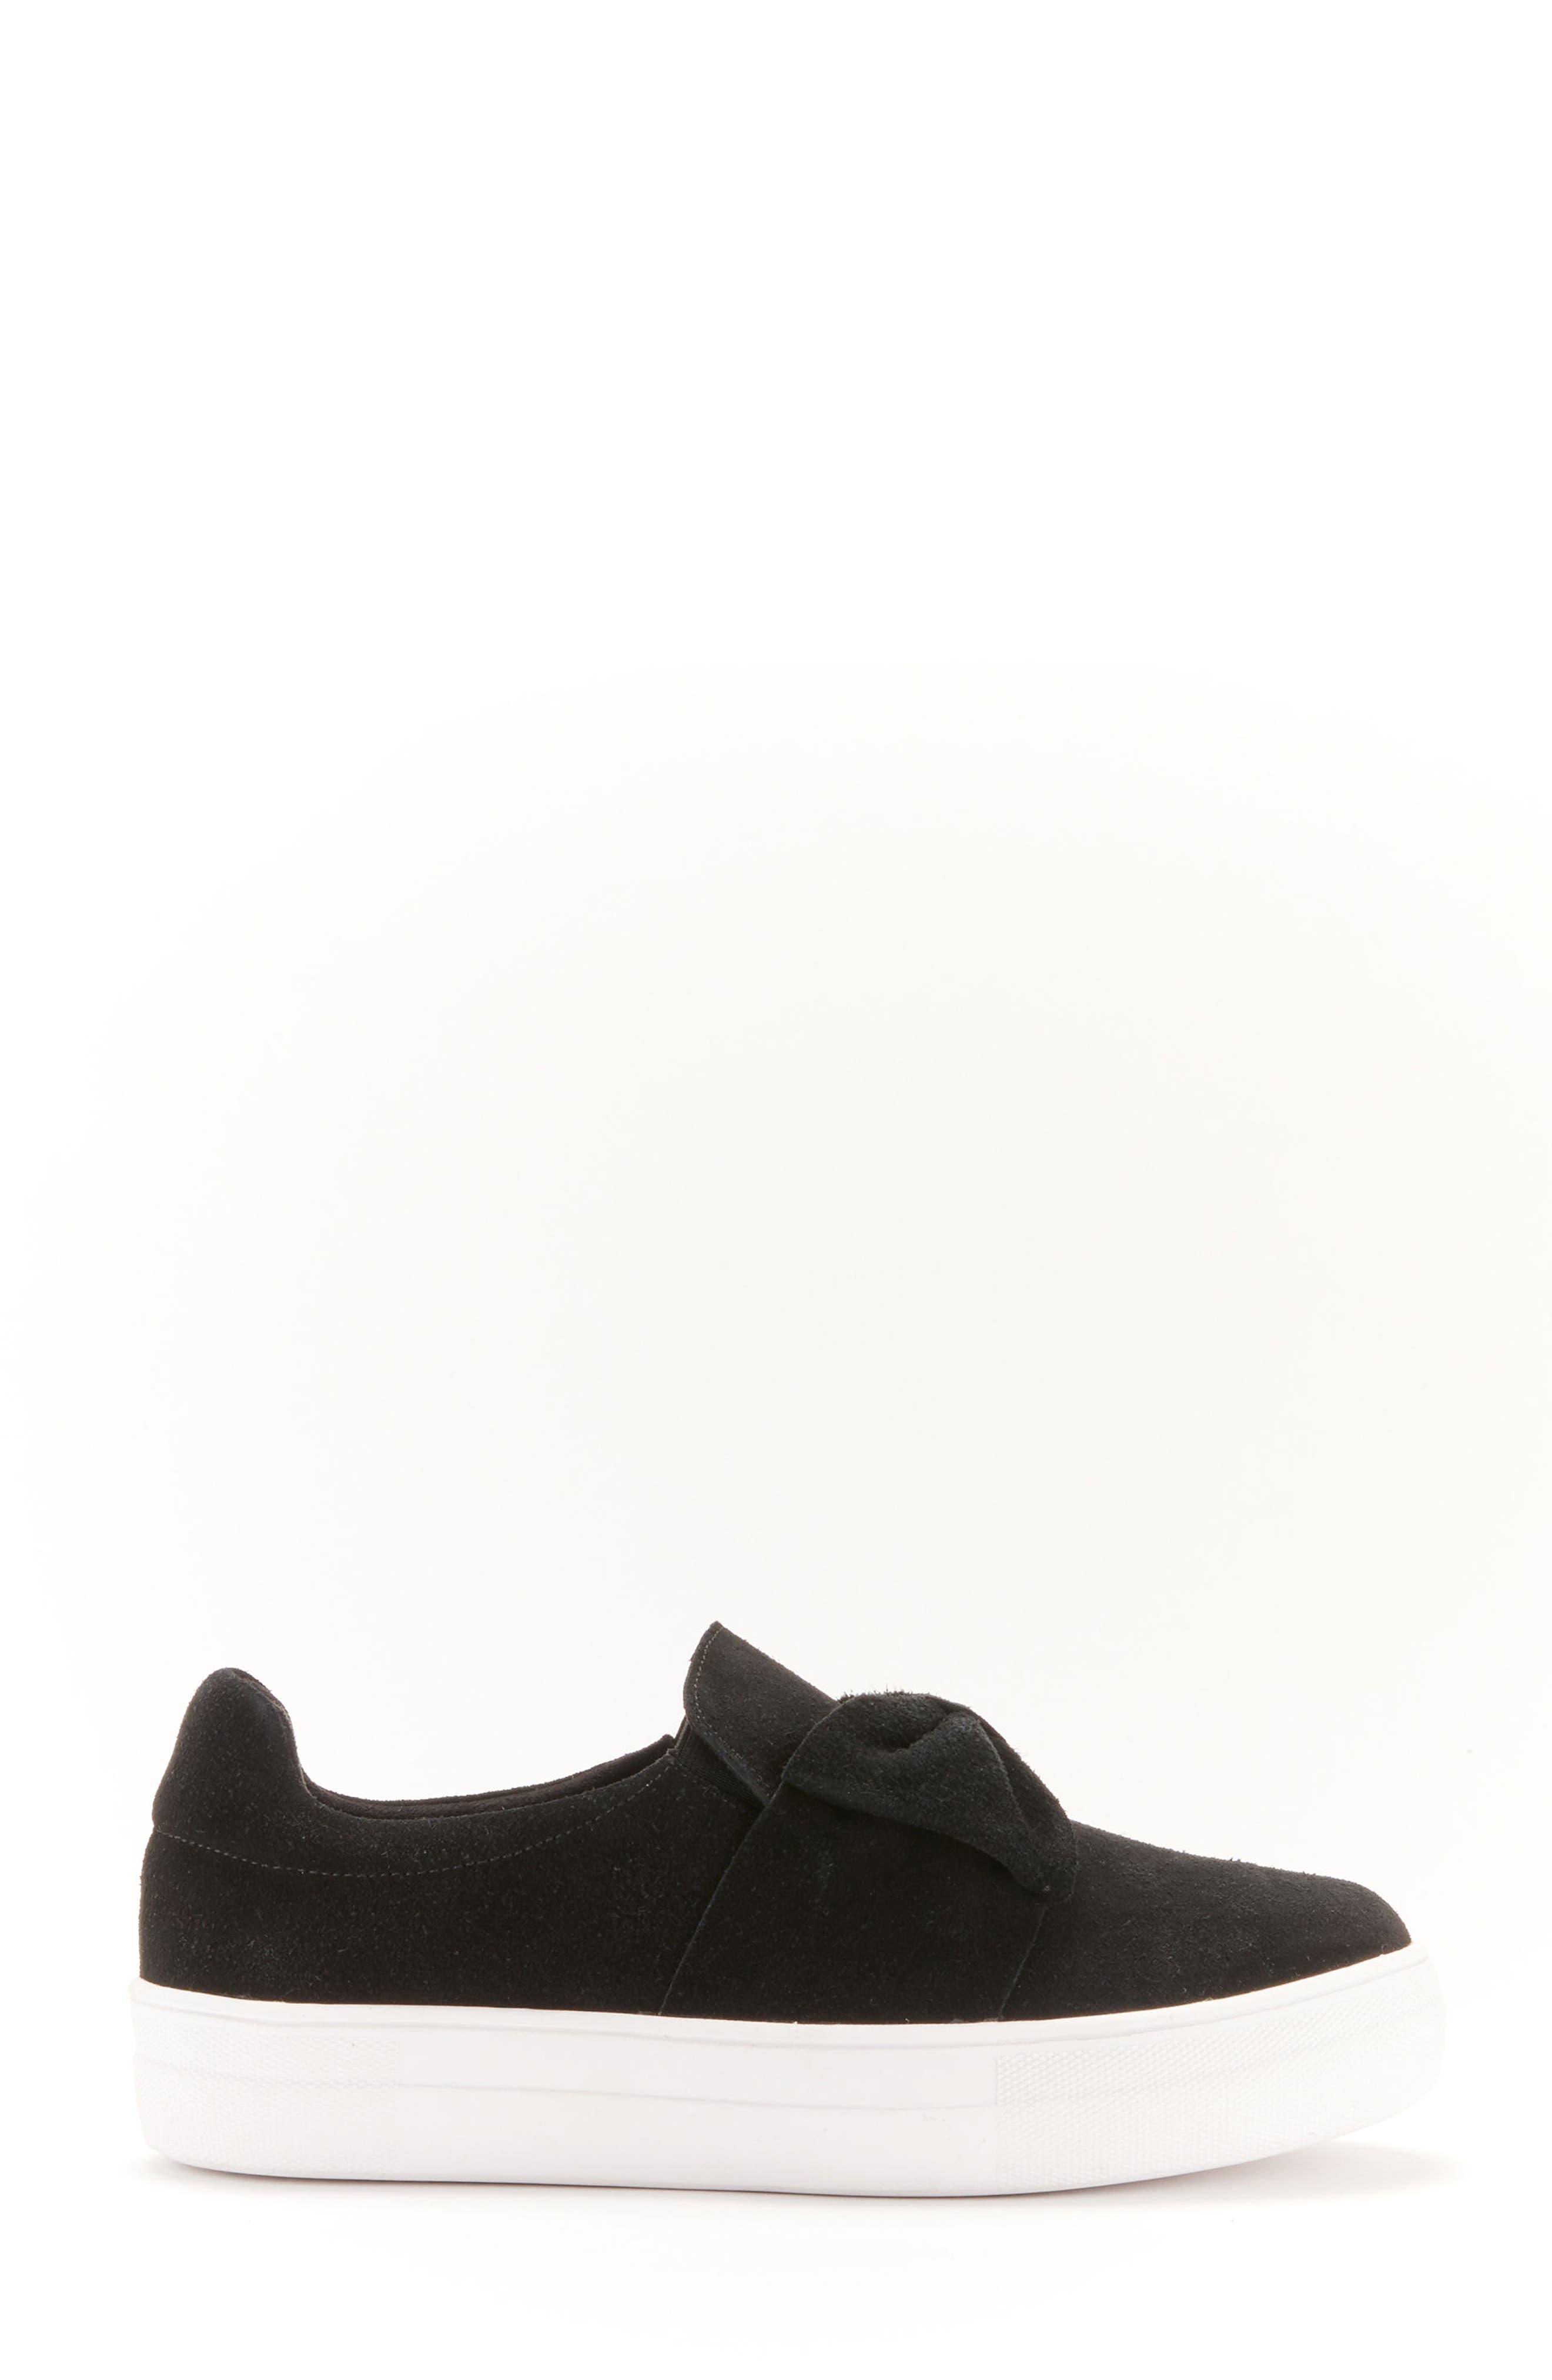 Gigi Sneaker,                             Alternate thumbnail 3, color,                             Black Suede